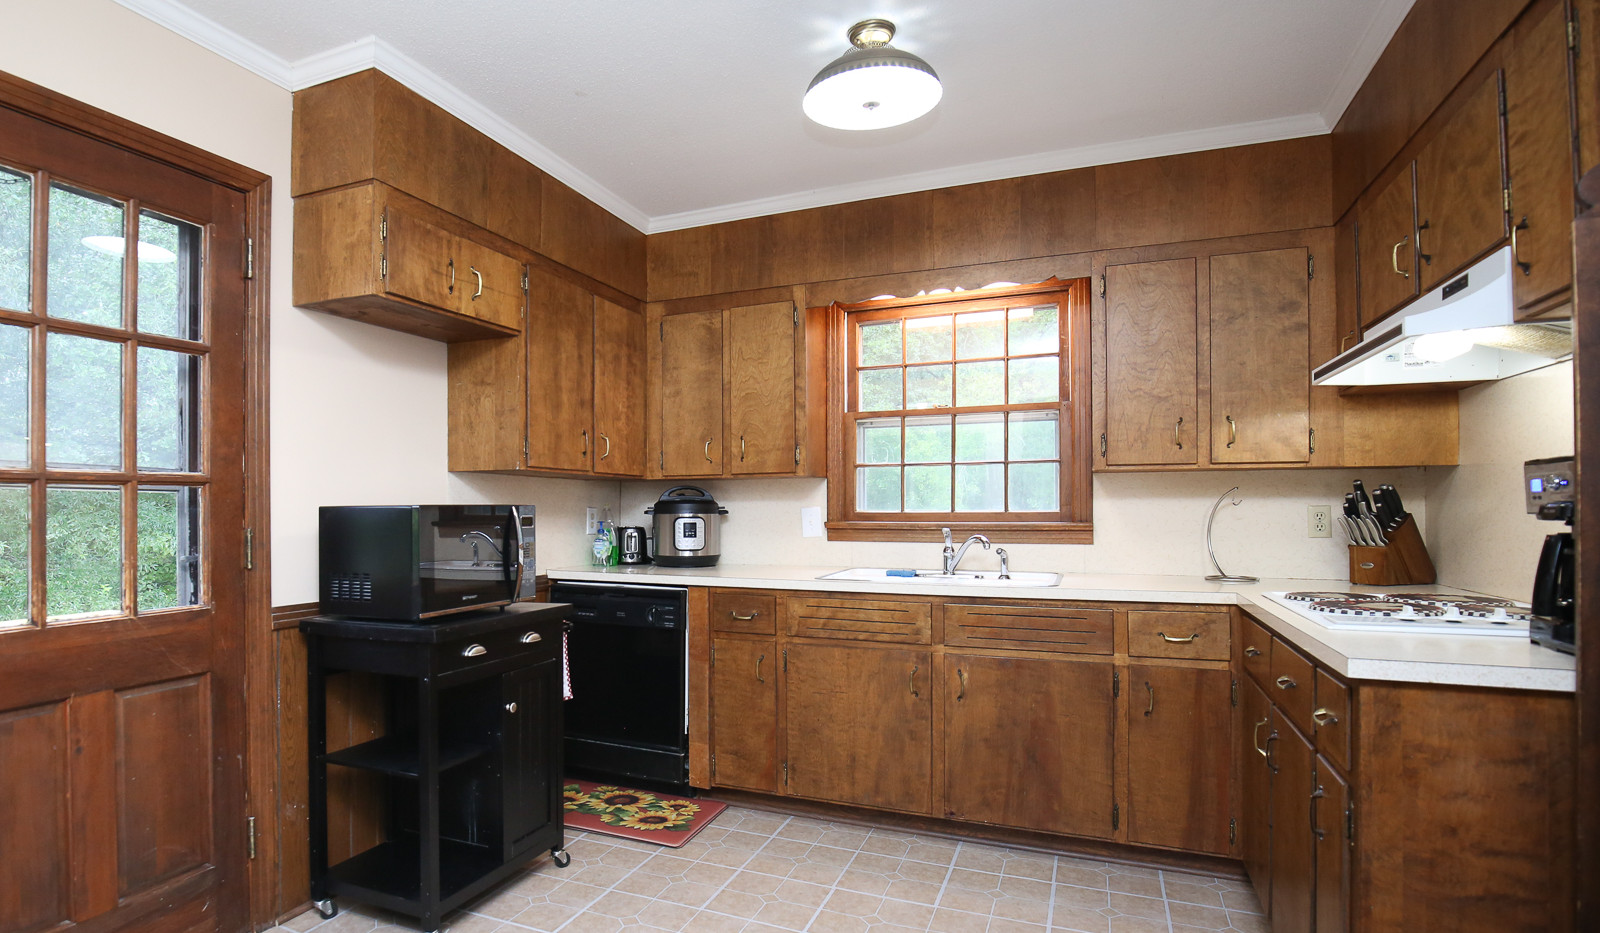 012_294_barnes_ave_kitchen.jpg